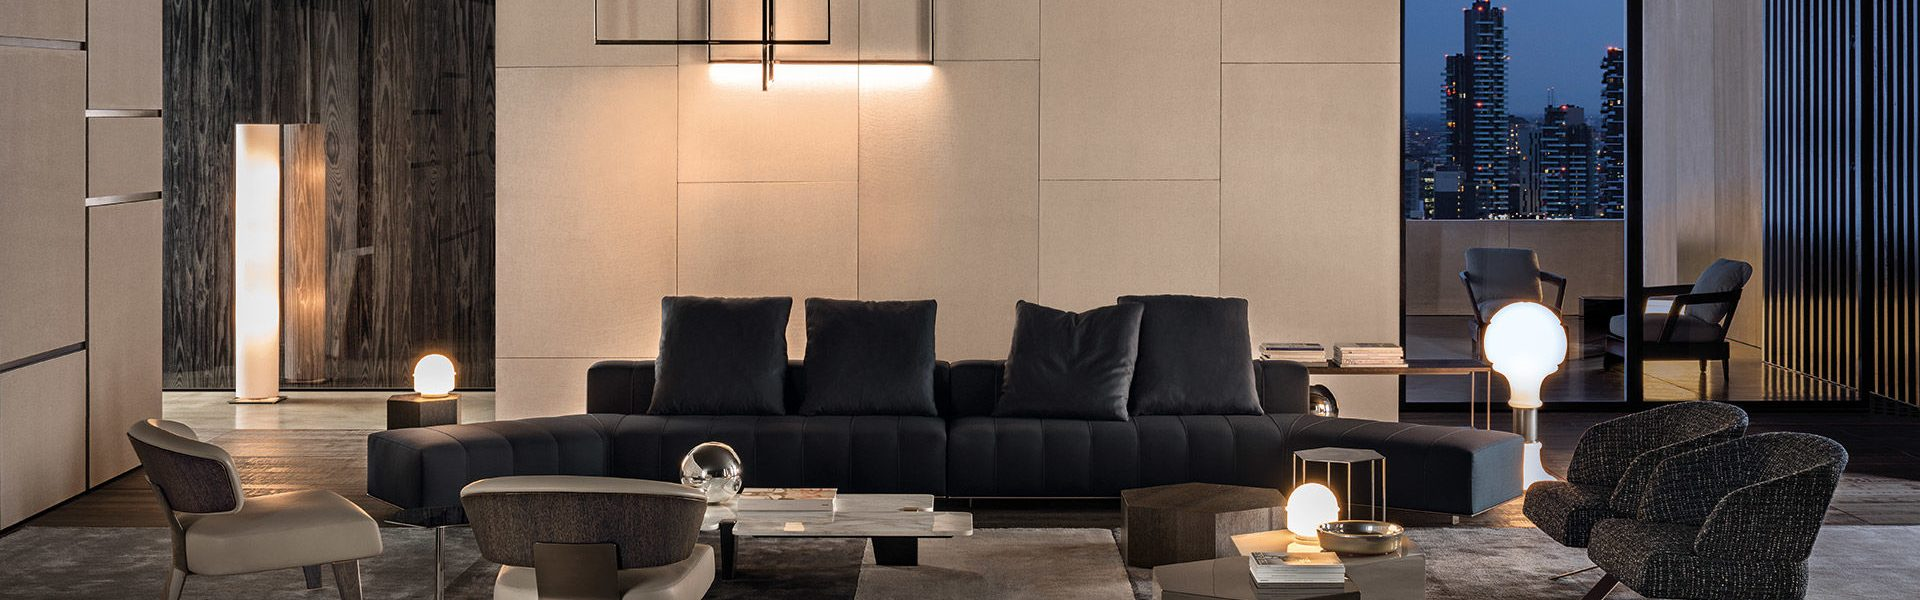 Freeman Lounge Sofa